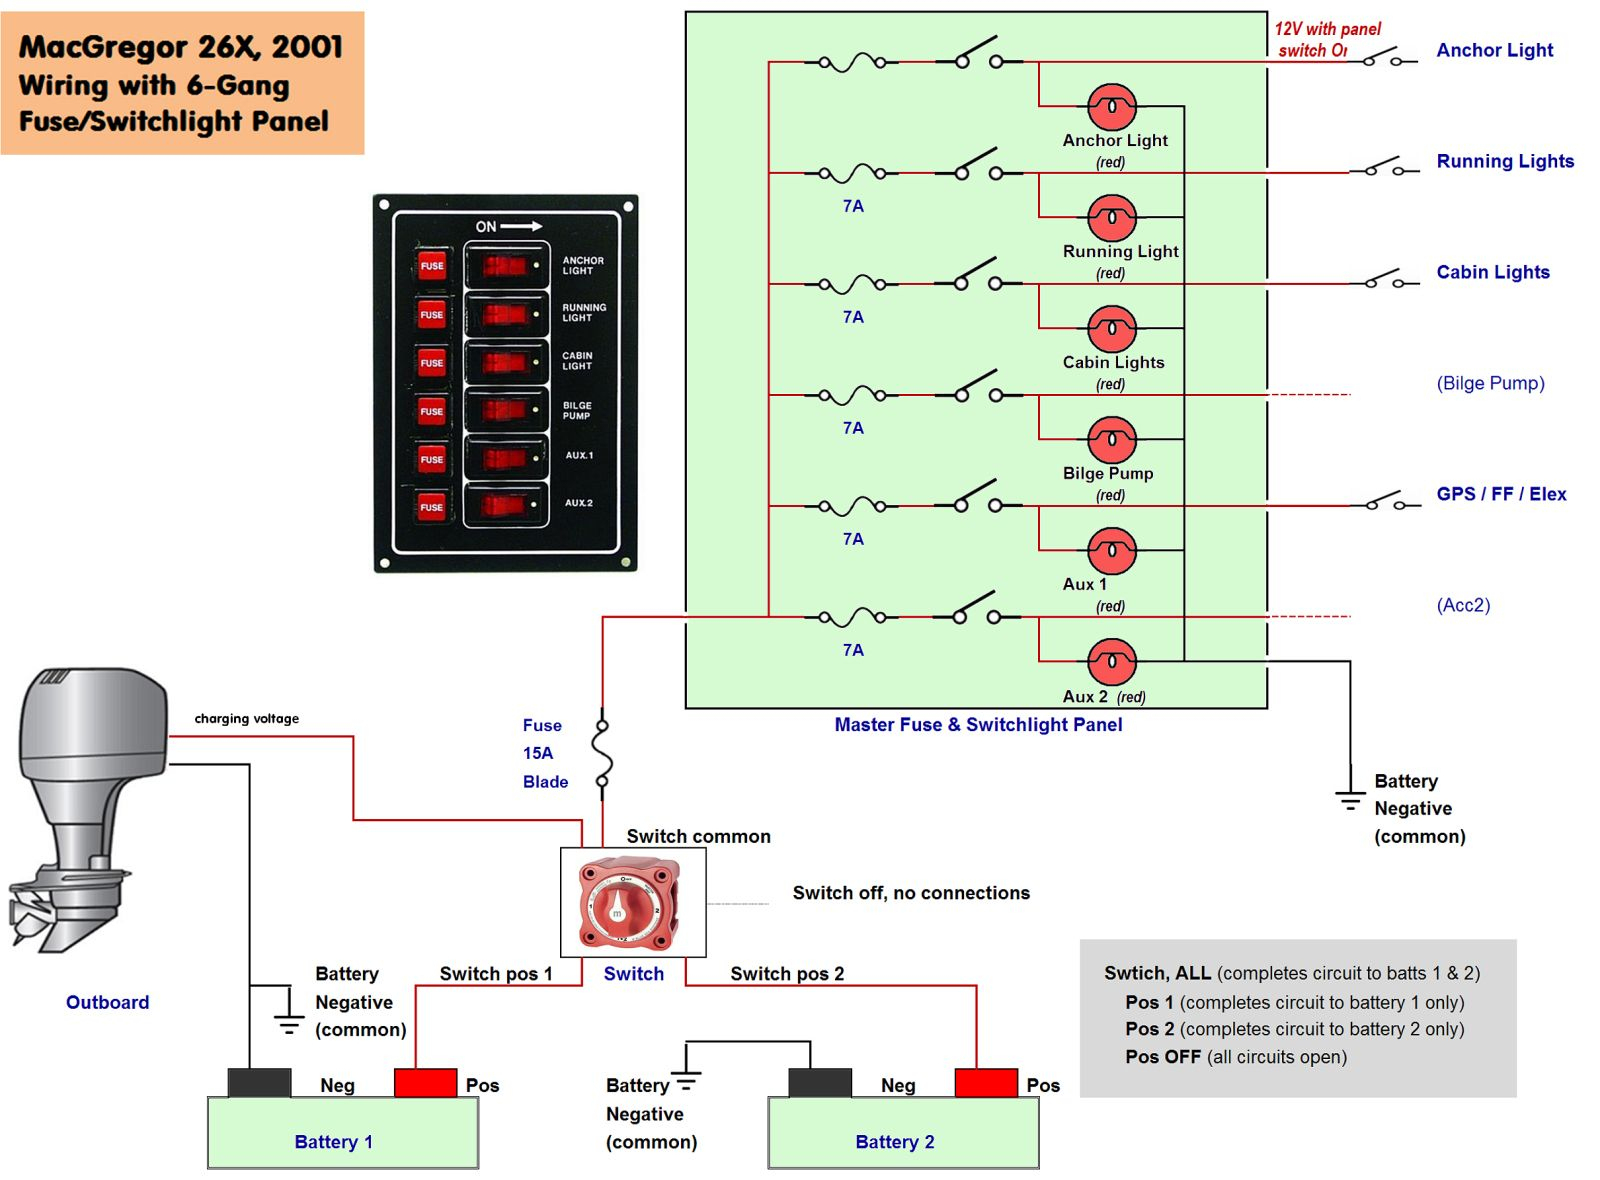 xpress boat wiring diagram wiring diagramsxpress boat diagram 15 10 malawi24 de \\u2022